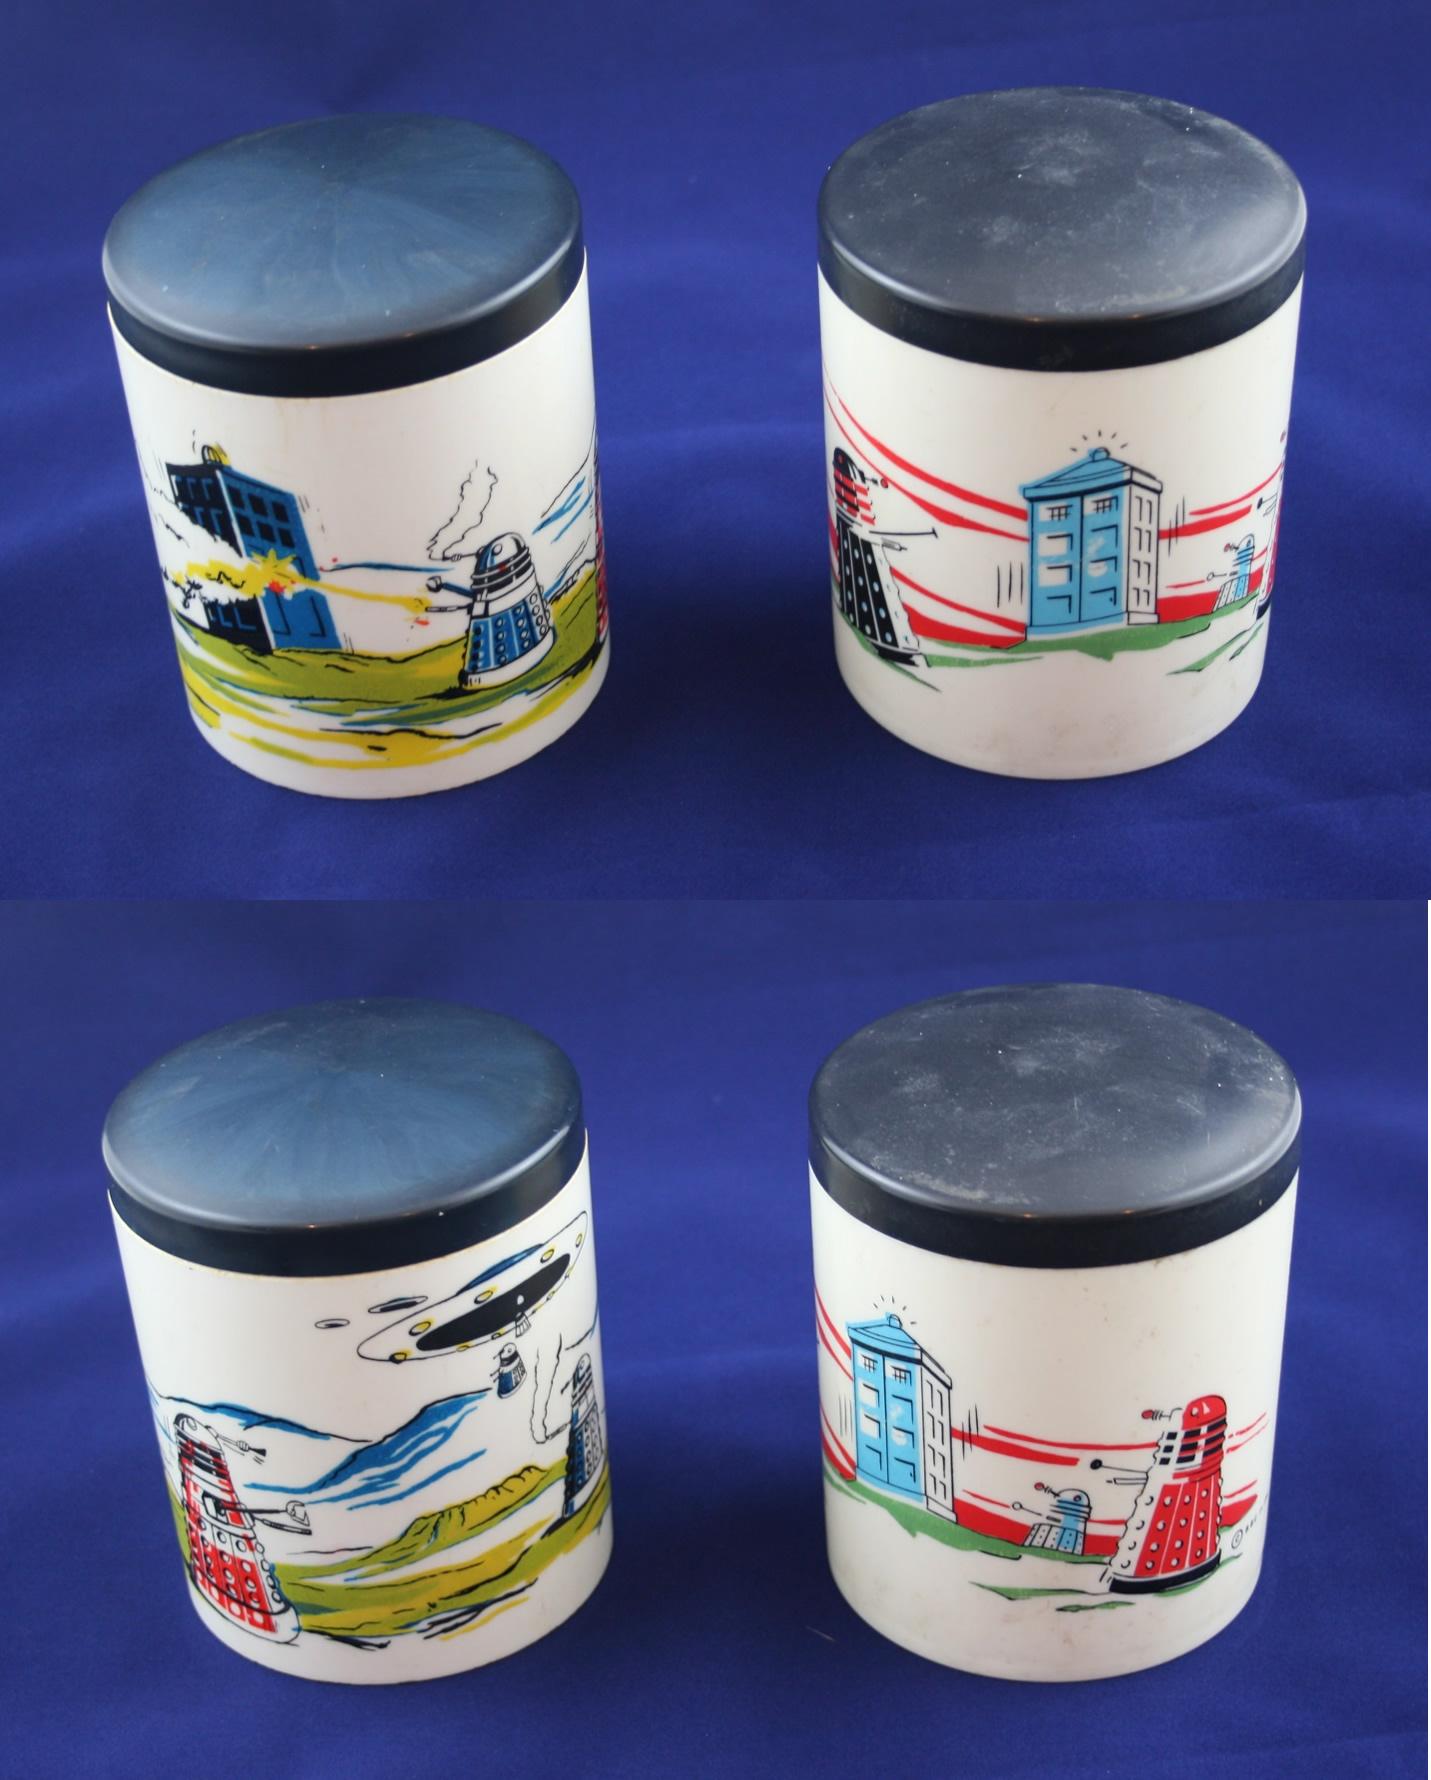 H & B Plastics Ltd., Dalek storage jars: TV Dalek (right, top & bottom) and prototype Movie Dalek (left, top & bottom)